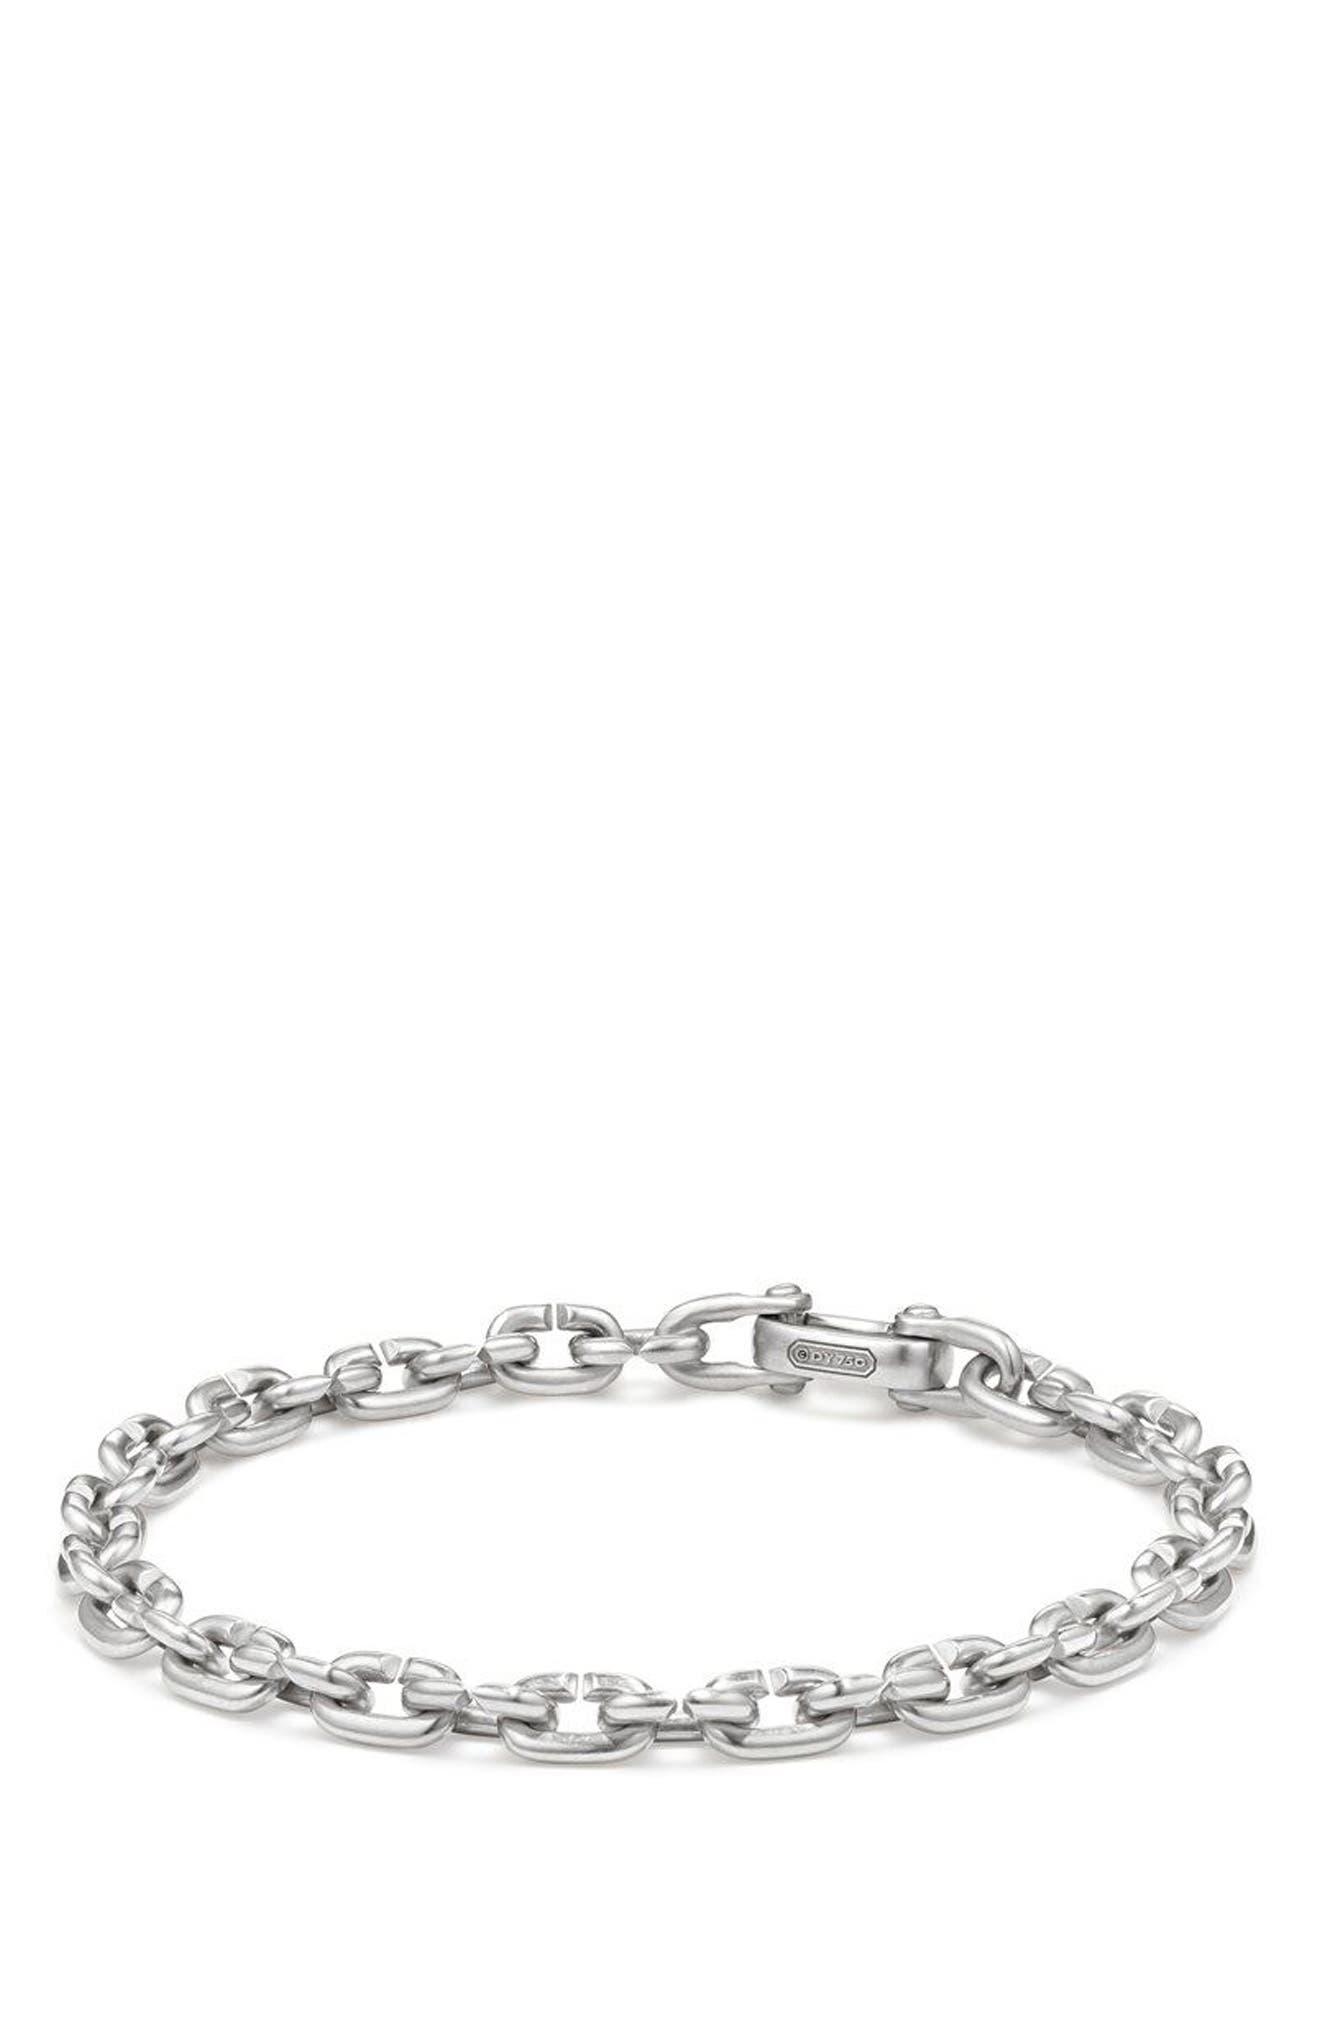 David Yurman Narrow Chain Link Bracelet